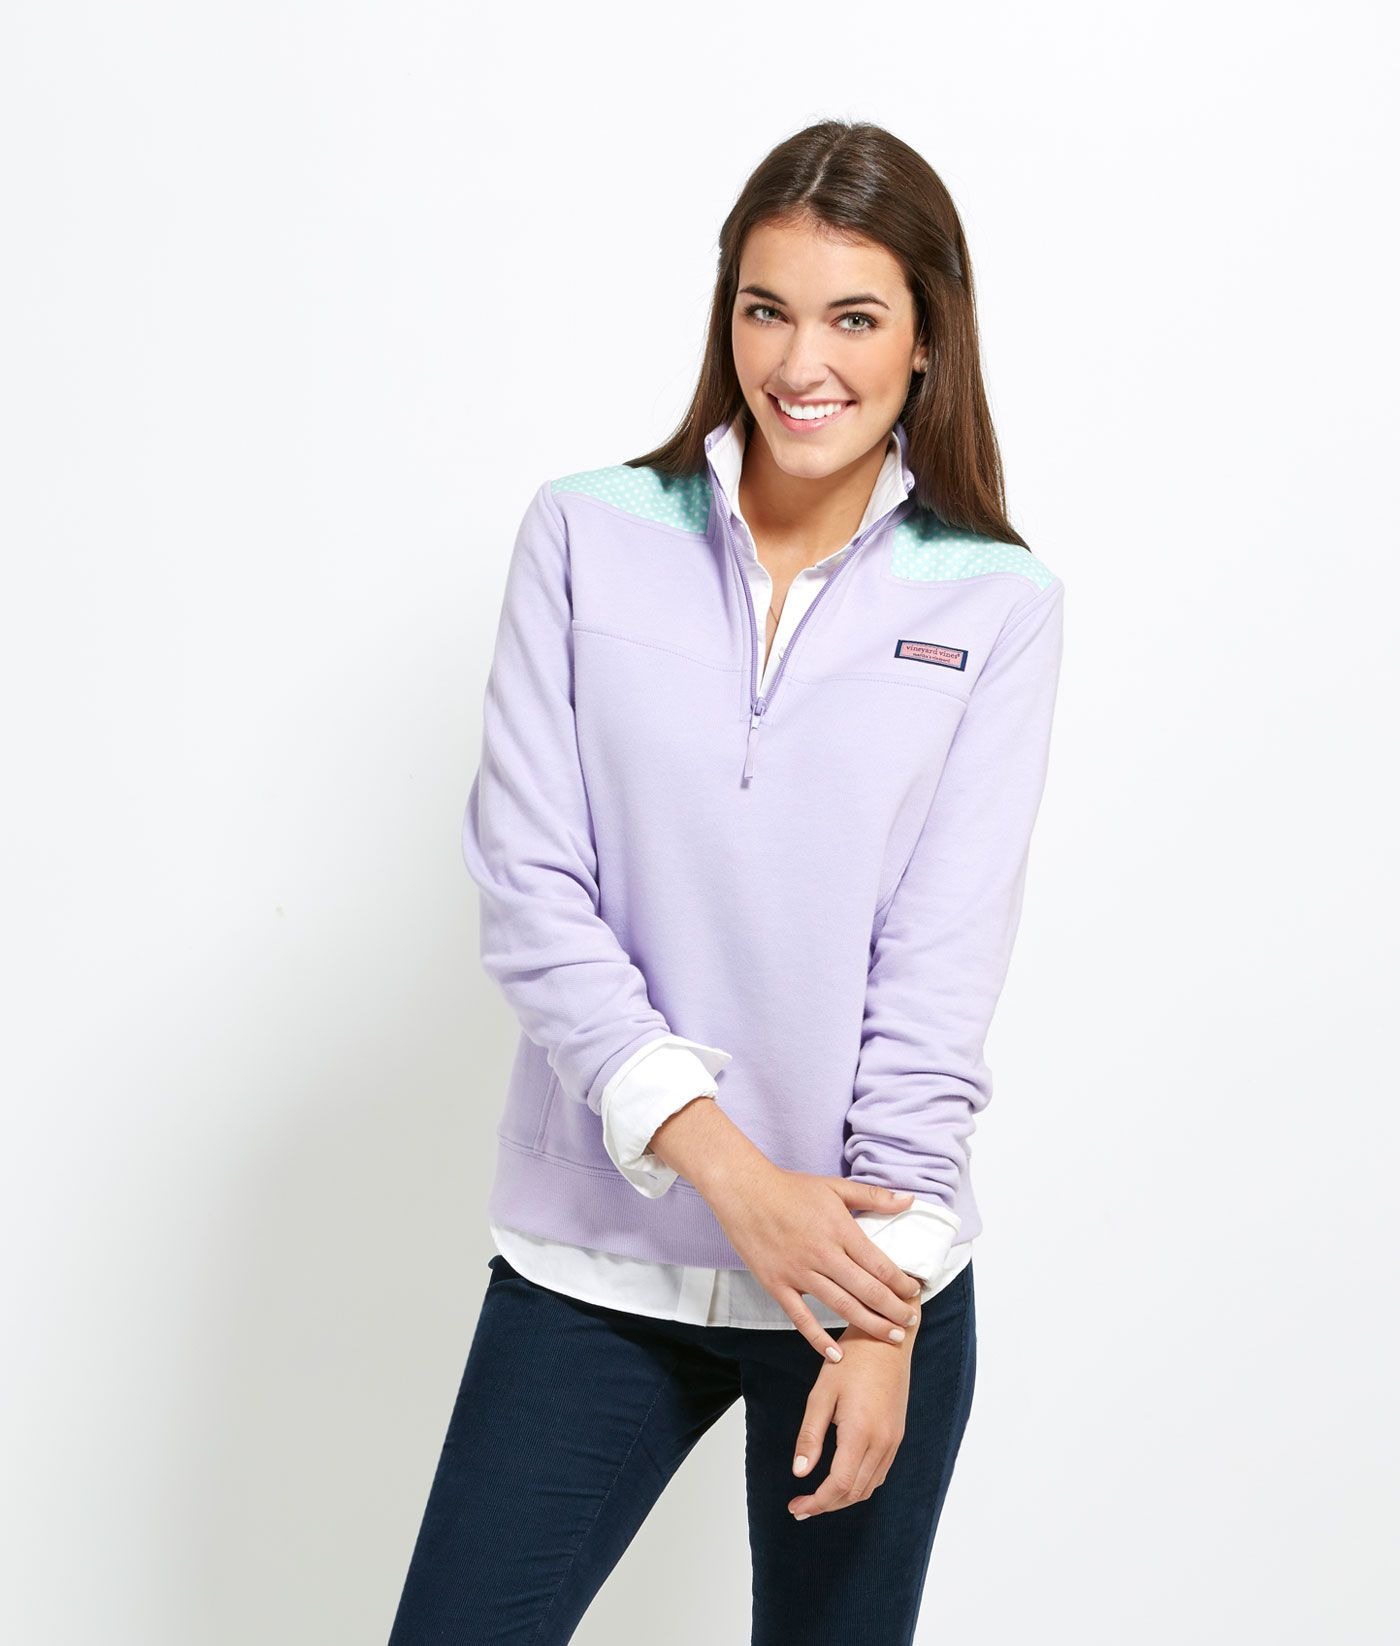 16d12b6ad6b007 Women's Pullovers: Polka Dot Shep Shirt for Women - Vineyard Vines ...